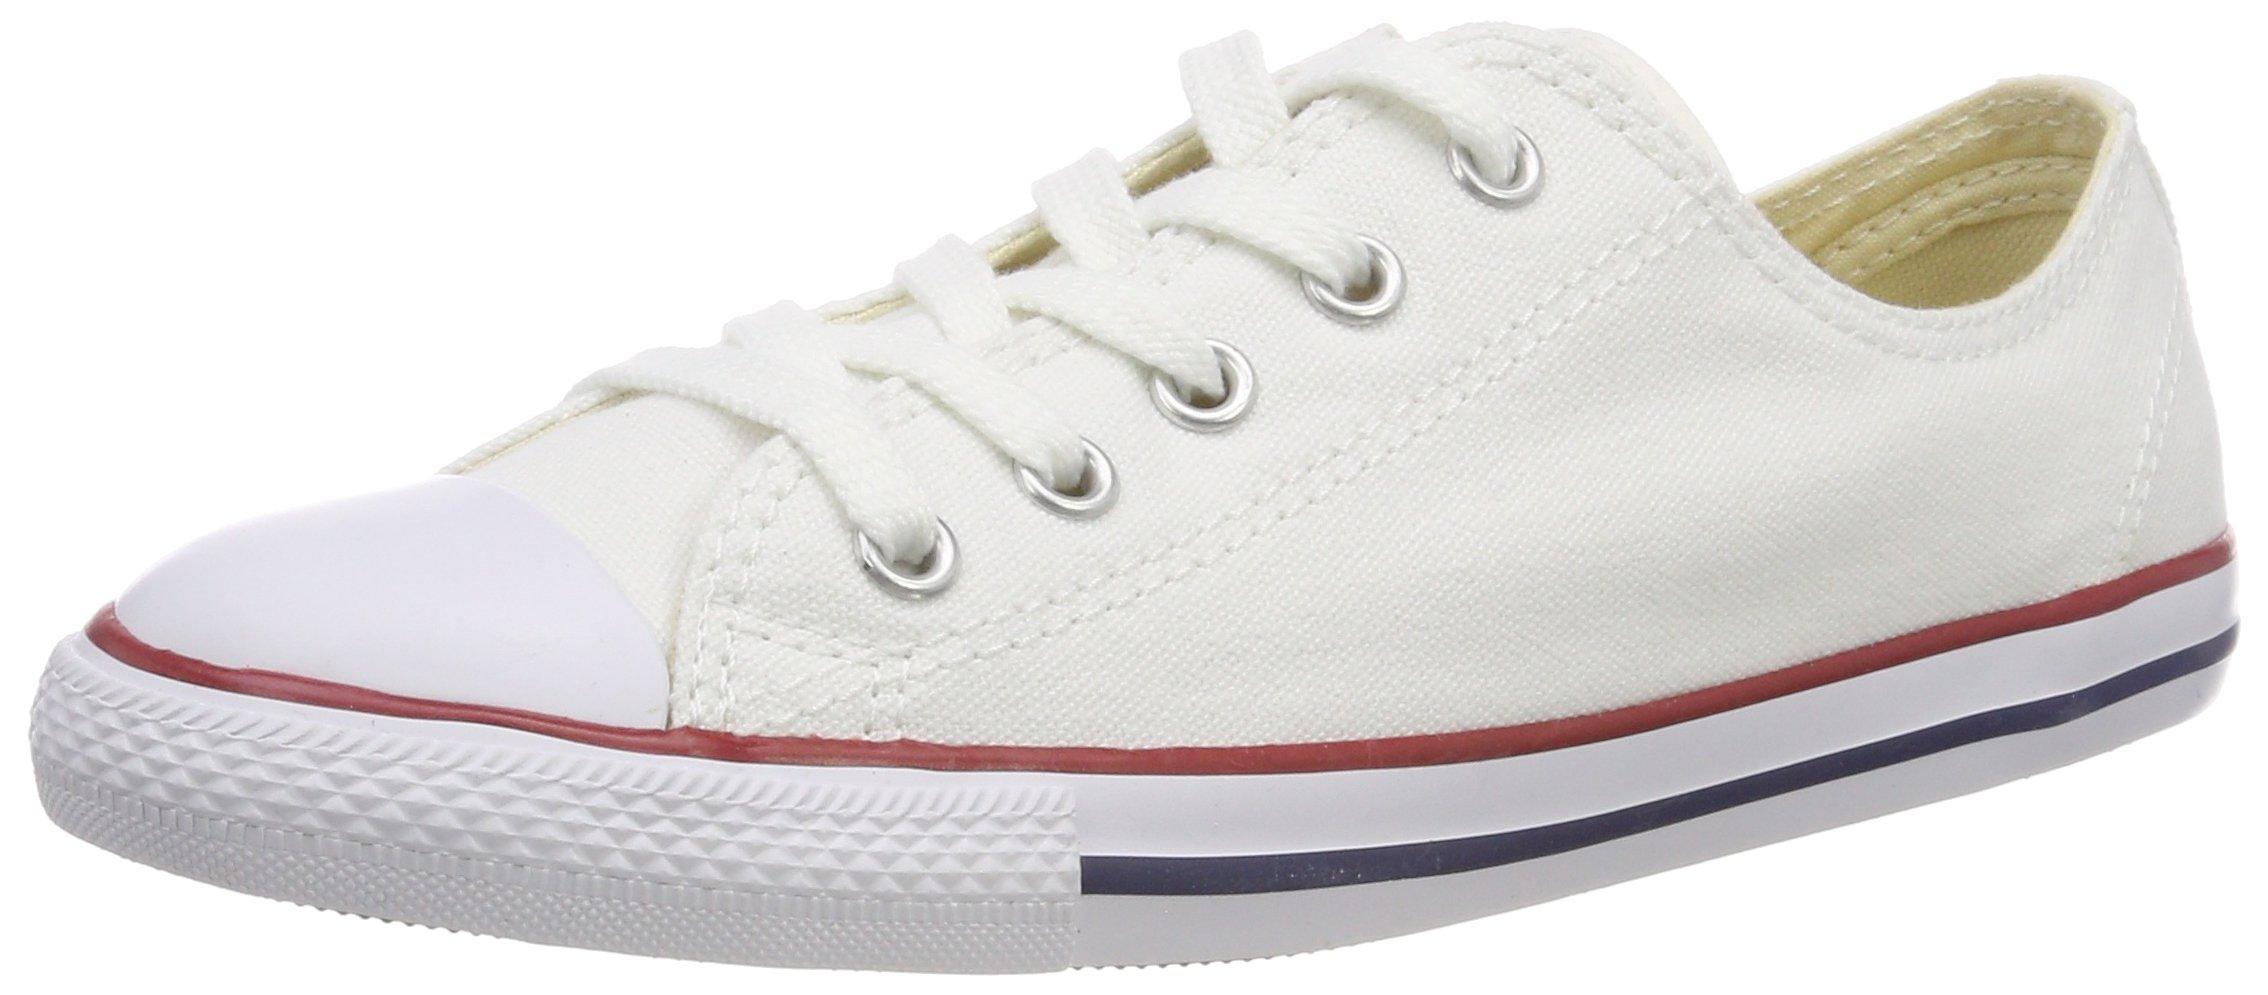 Converse Women's Dainty Canvas Low Top Sneaker, White, 10 M US